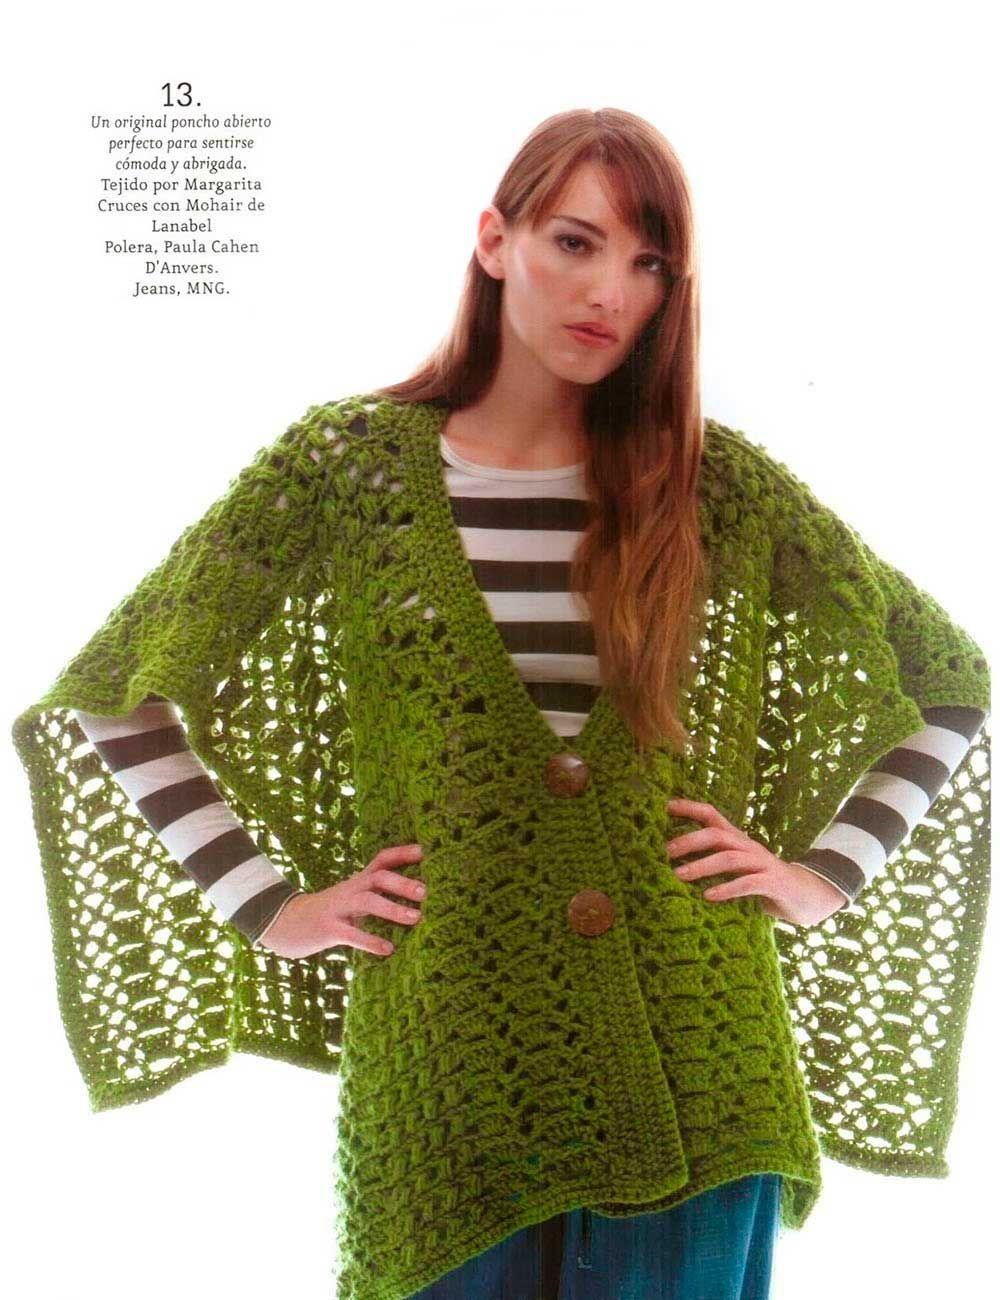 Pin de Daniela Allel Stuardo en Crochet | Pinterest | Patrón gratis ...